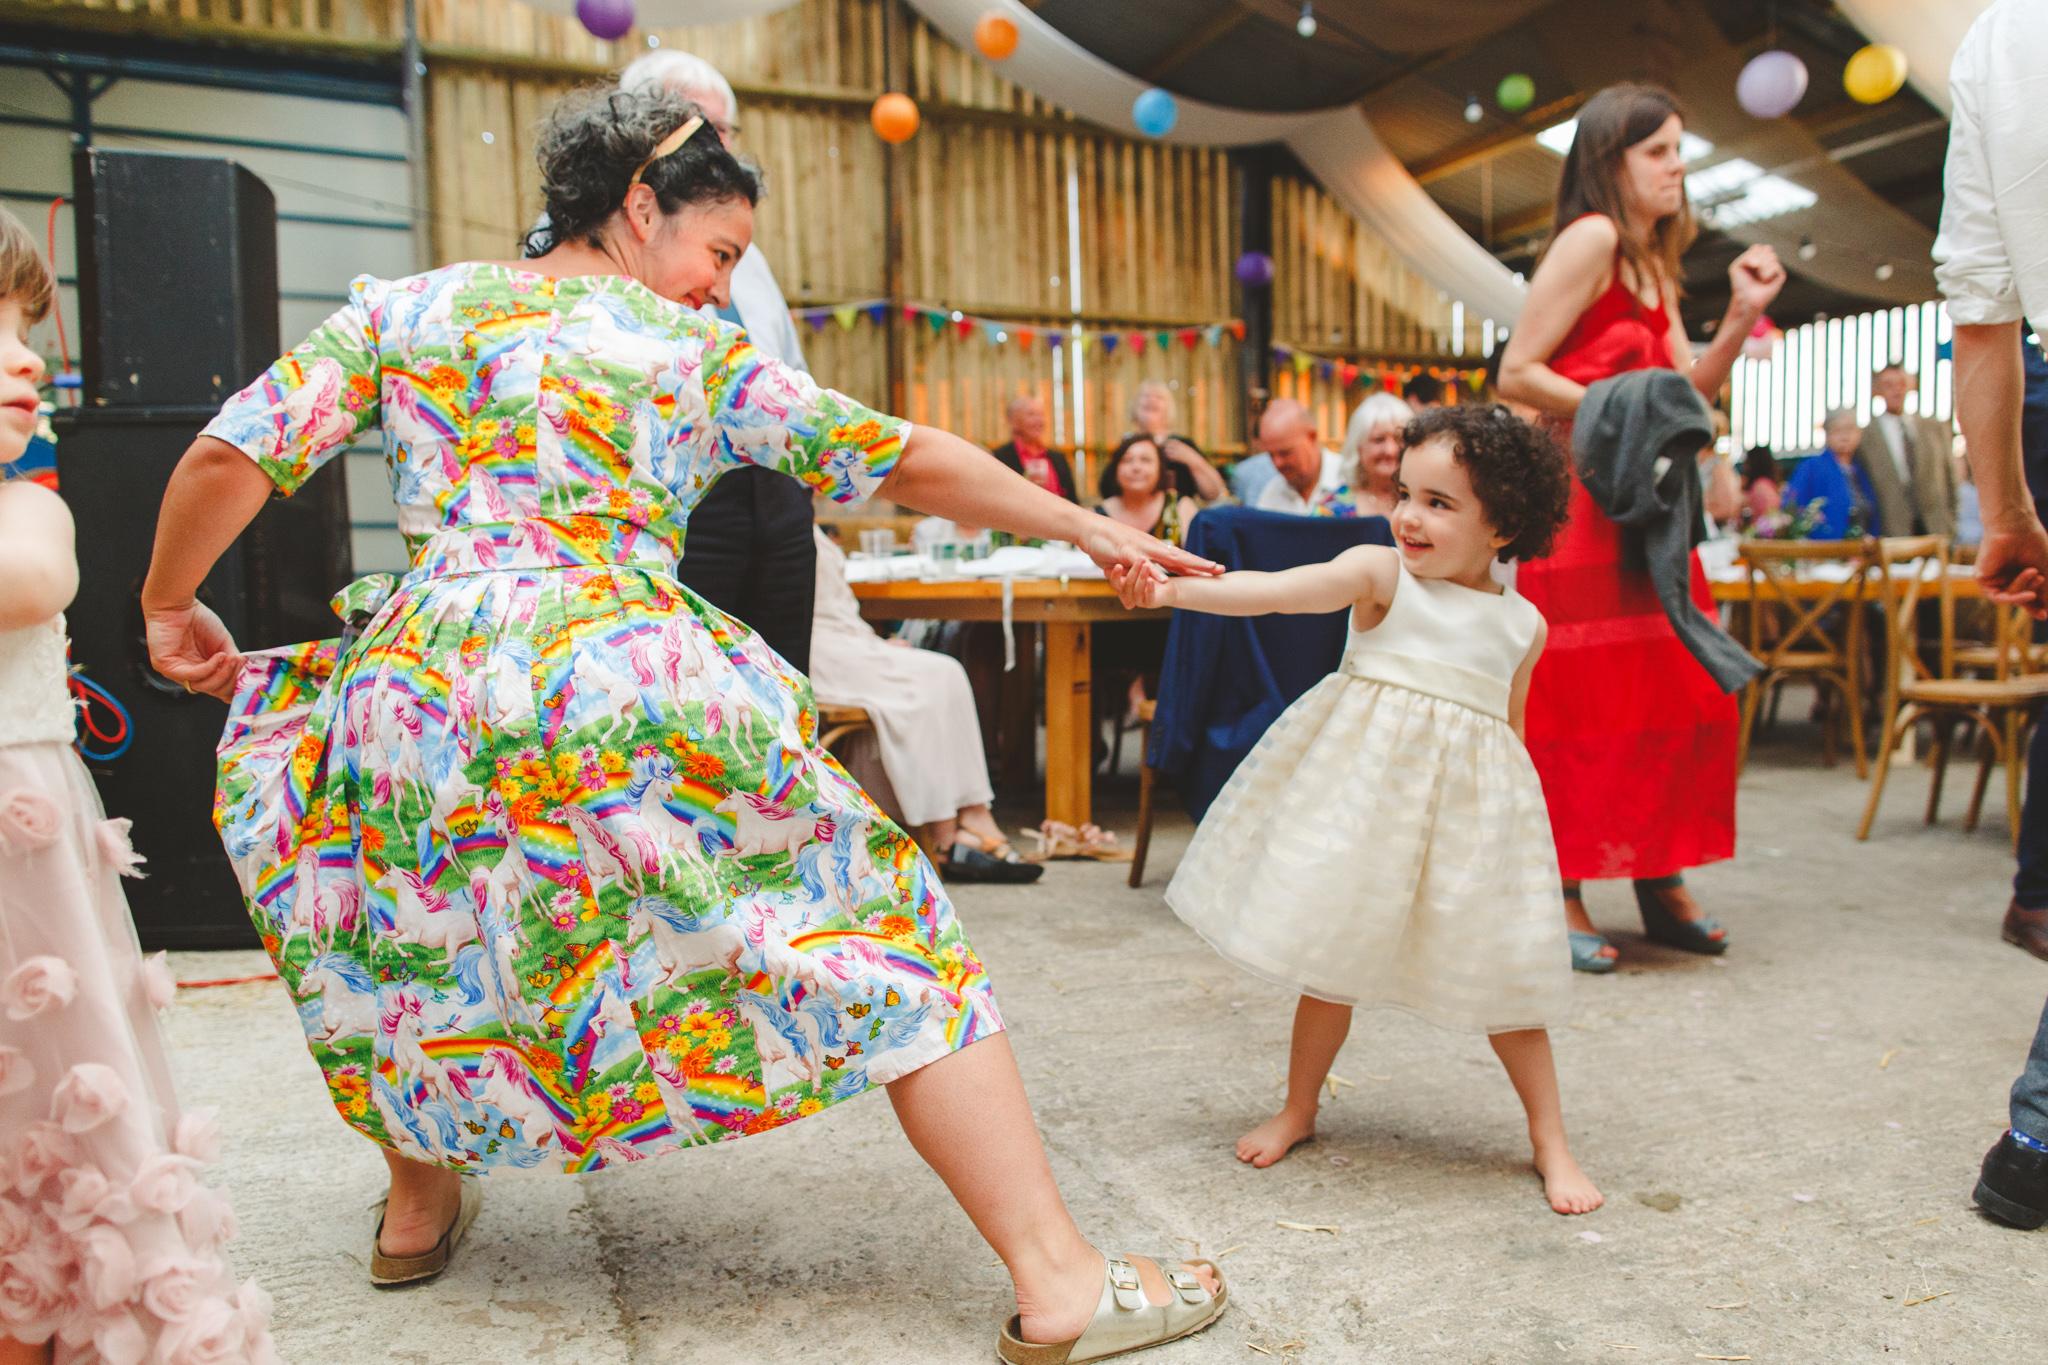 derbyshire-wedding-photographer-videographer-camera-hannah-86.jpg